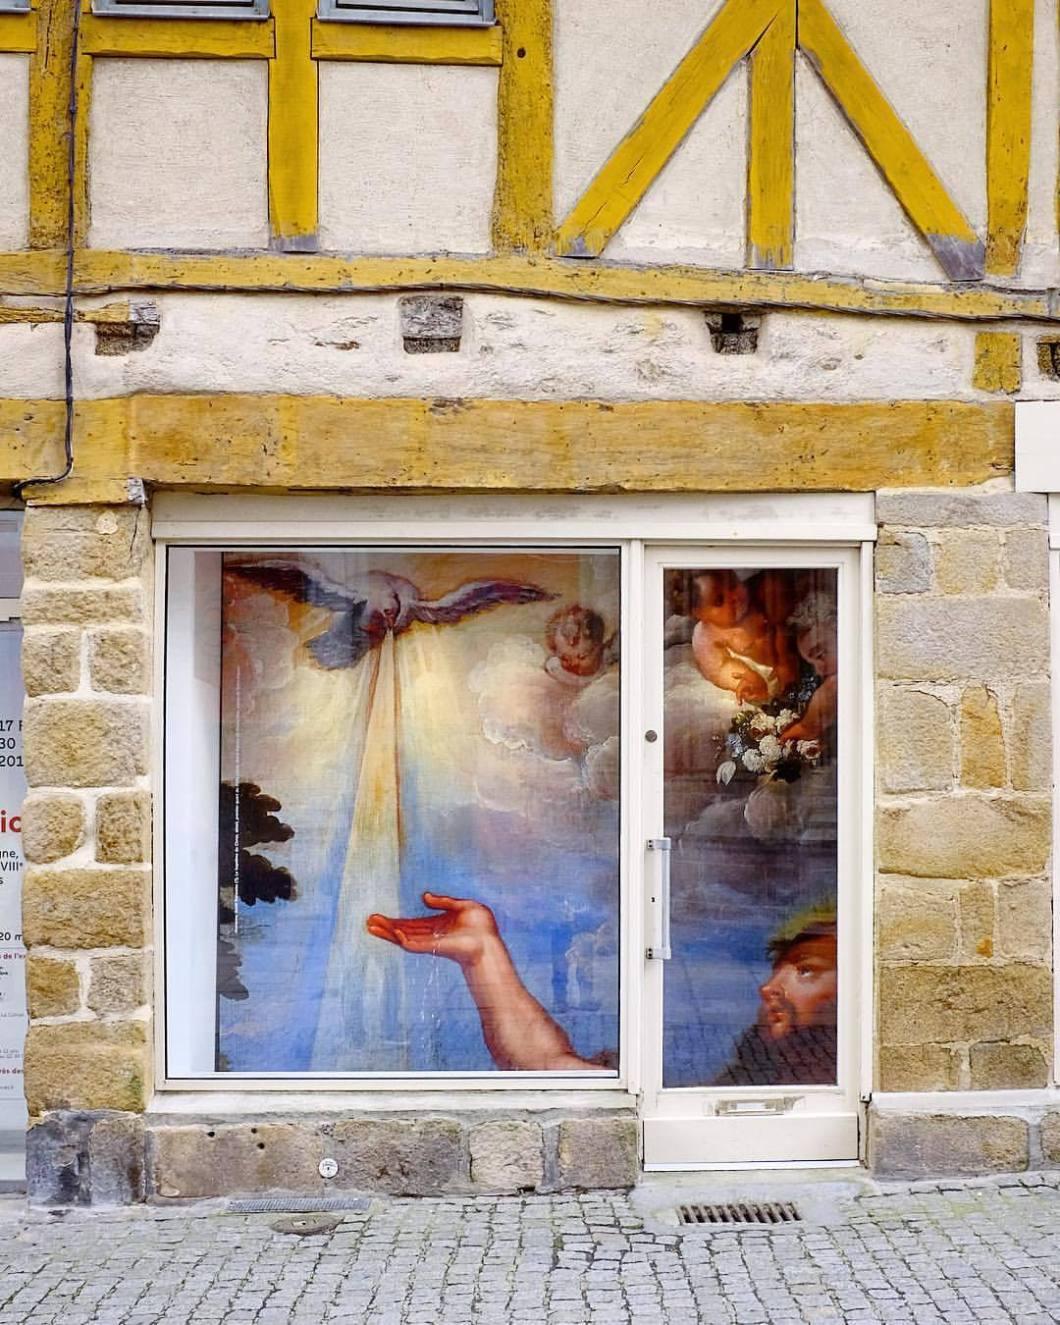 Bretagne, 2018..#photooftheday #onephotoaday #photography #fujix100t #france #bretagne #britanny #quimper #cathedrale #kirche #church #tradition #religion #catholic #christian #schaufenster #god #dove #holy (hier: Bretagne, France)